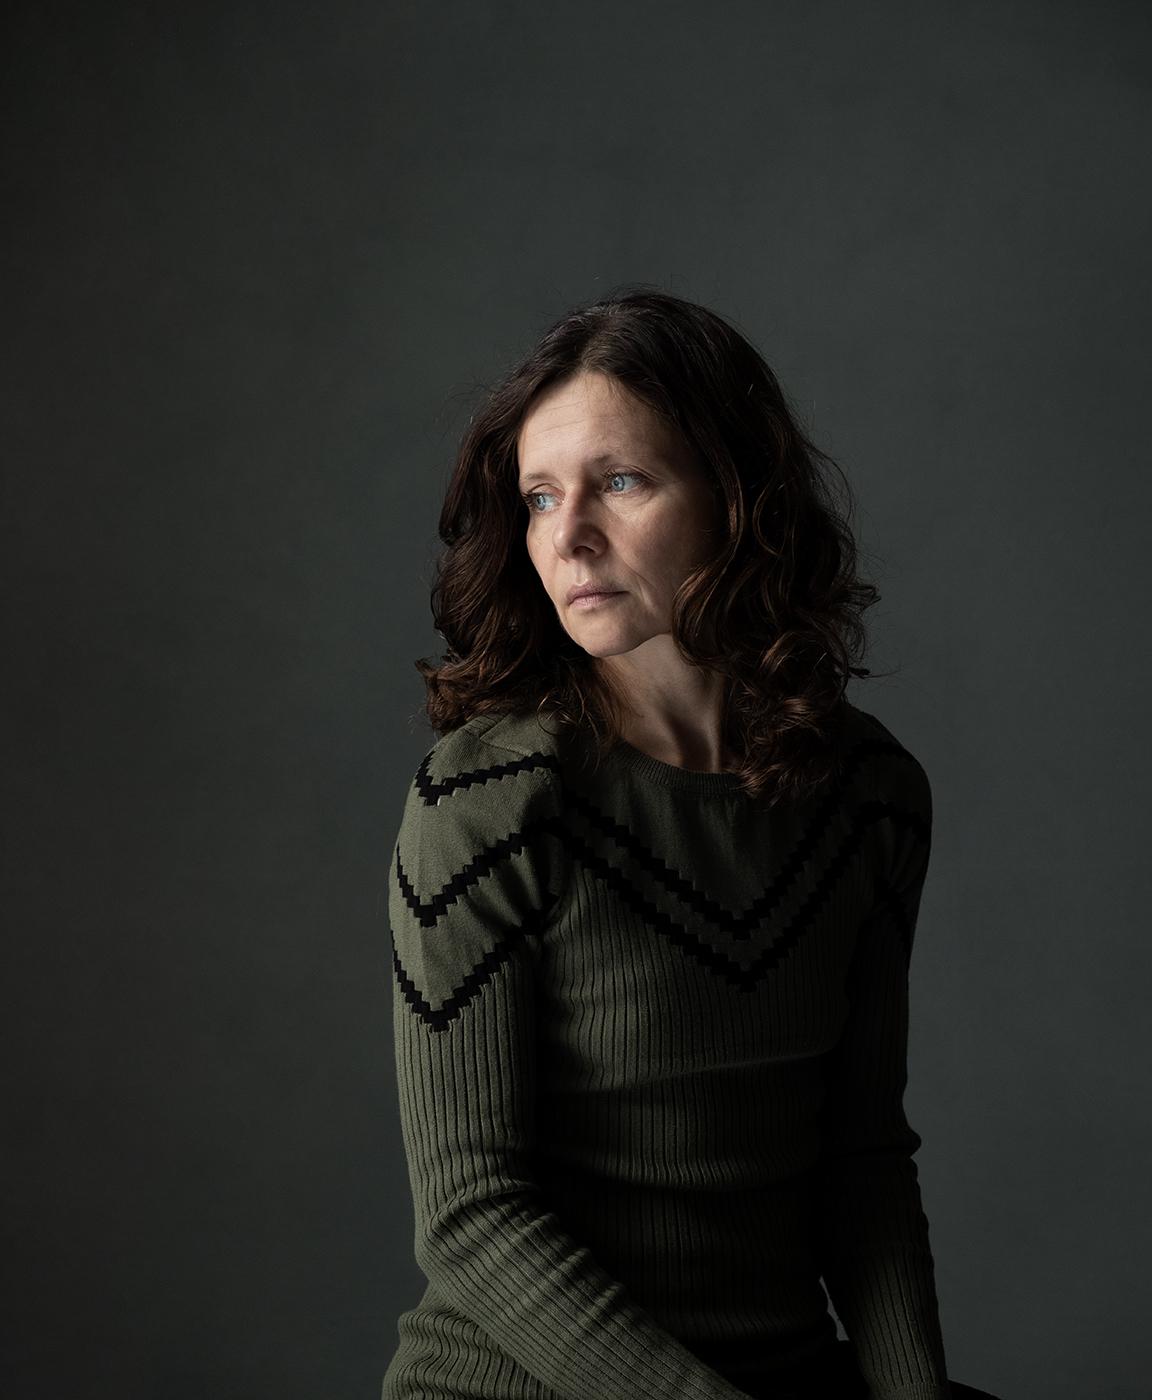 portret, portrait, portretfotografie, portraitphotography, Susanne Middelberg